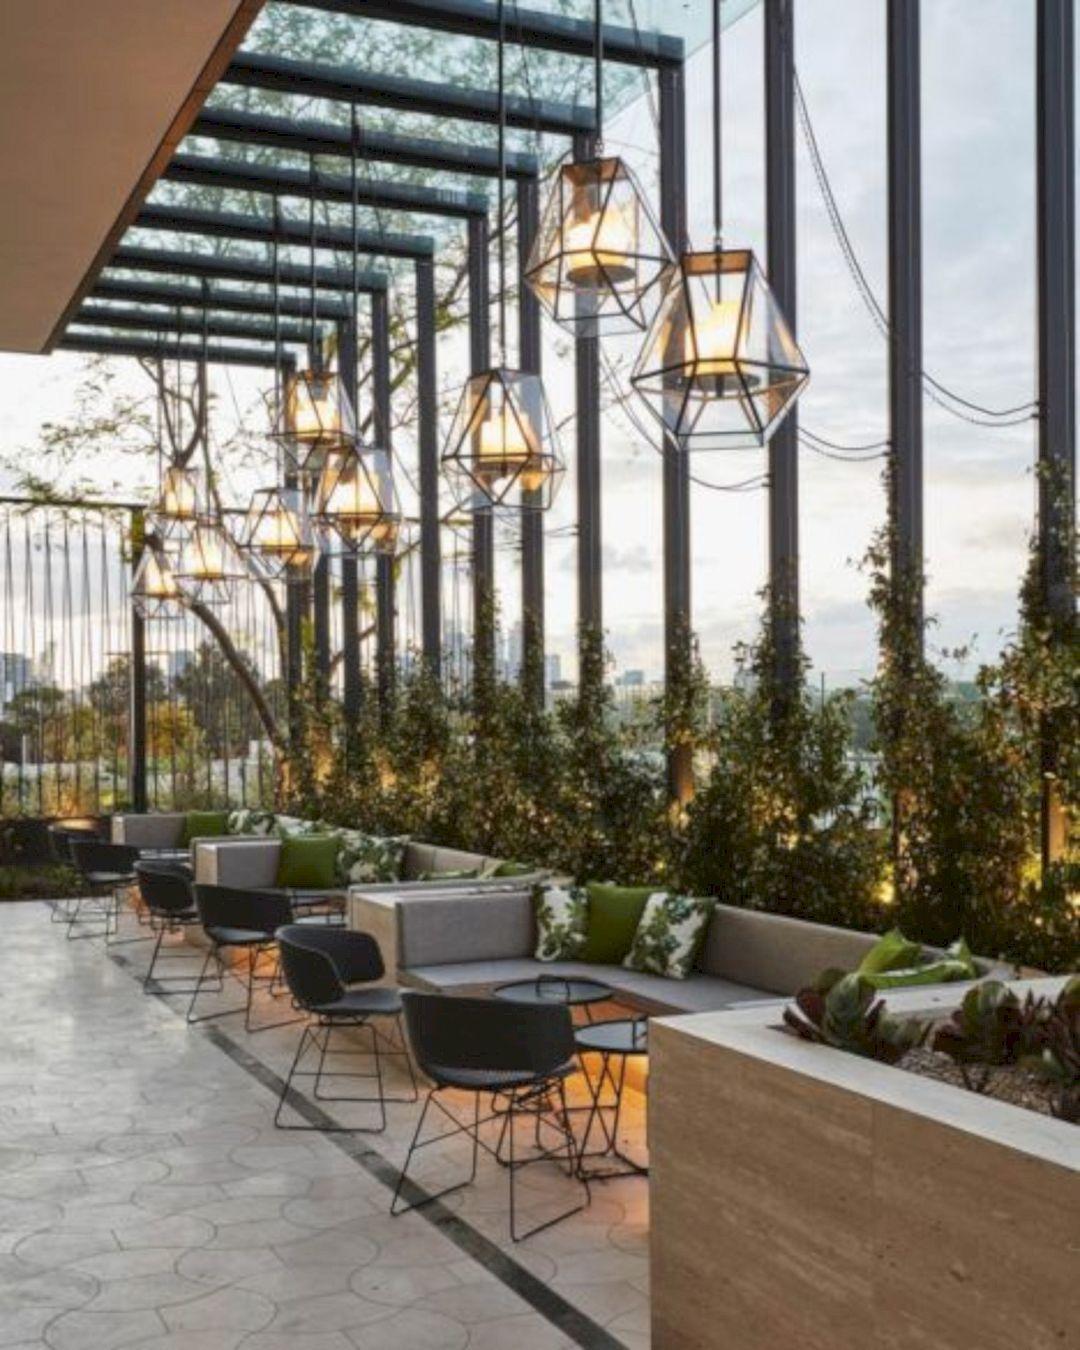 15 Café Shop Interior Design ideas to Lure Customers   Interiors ...